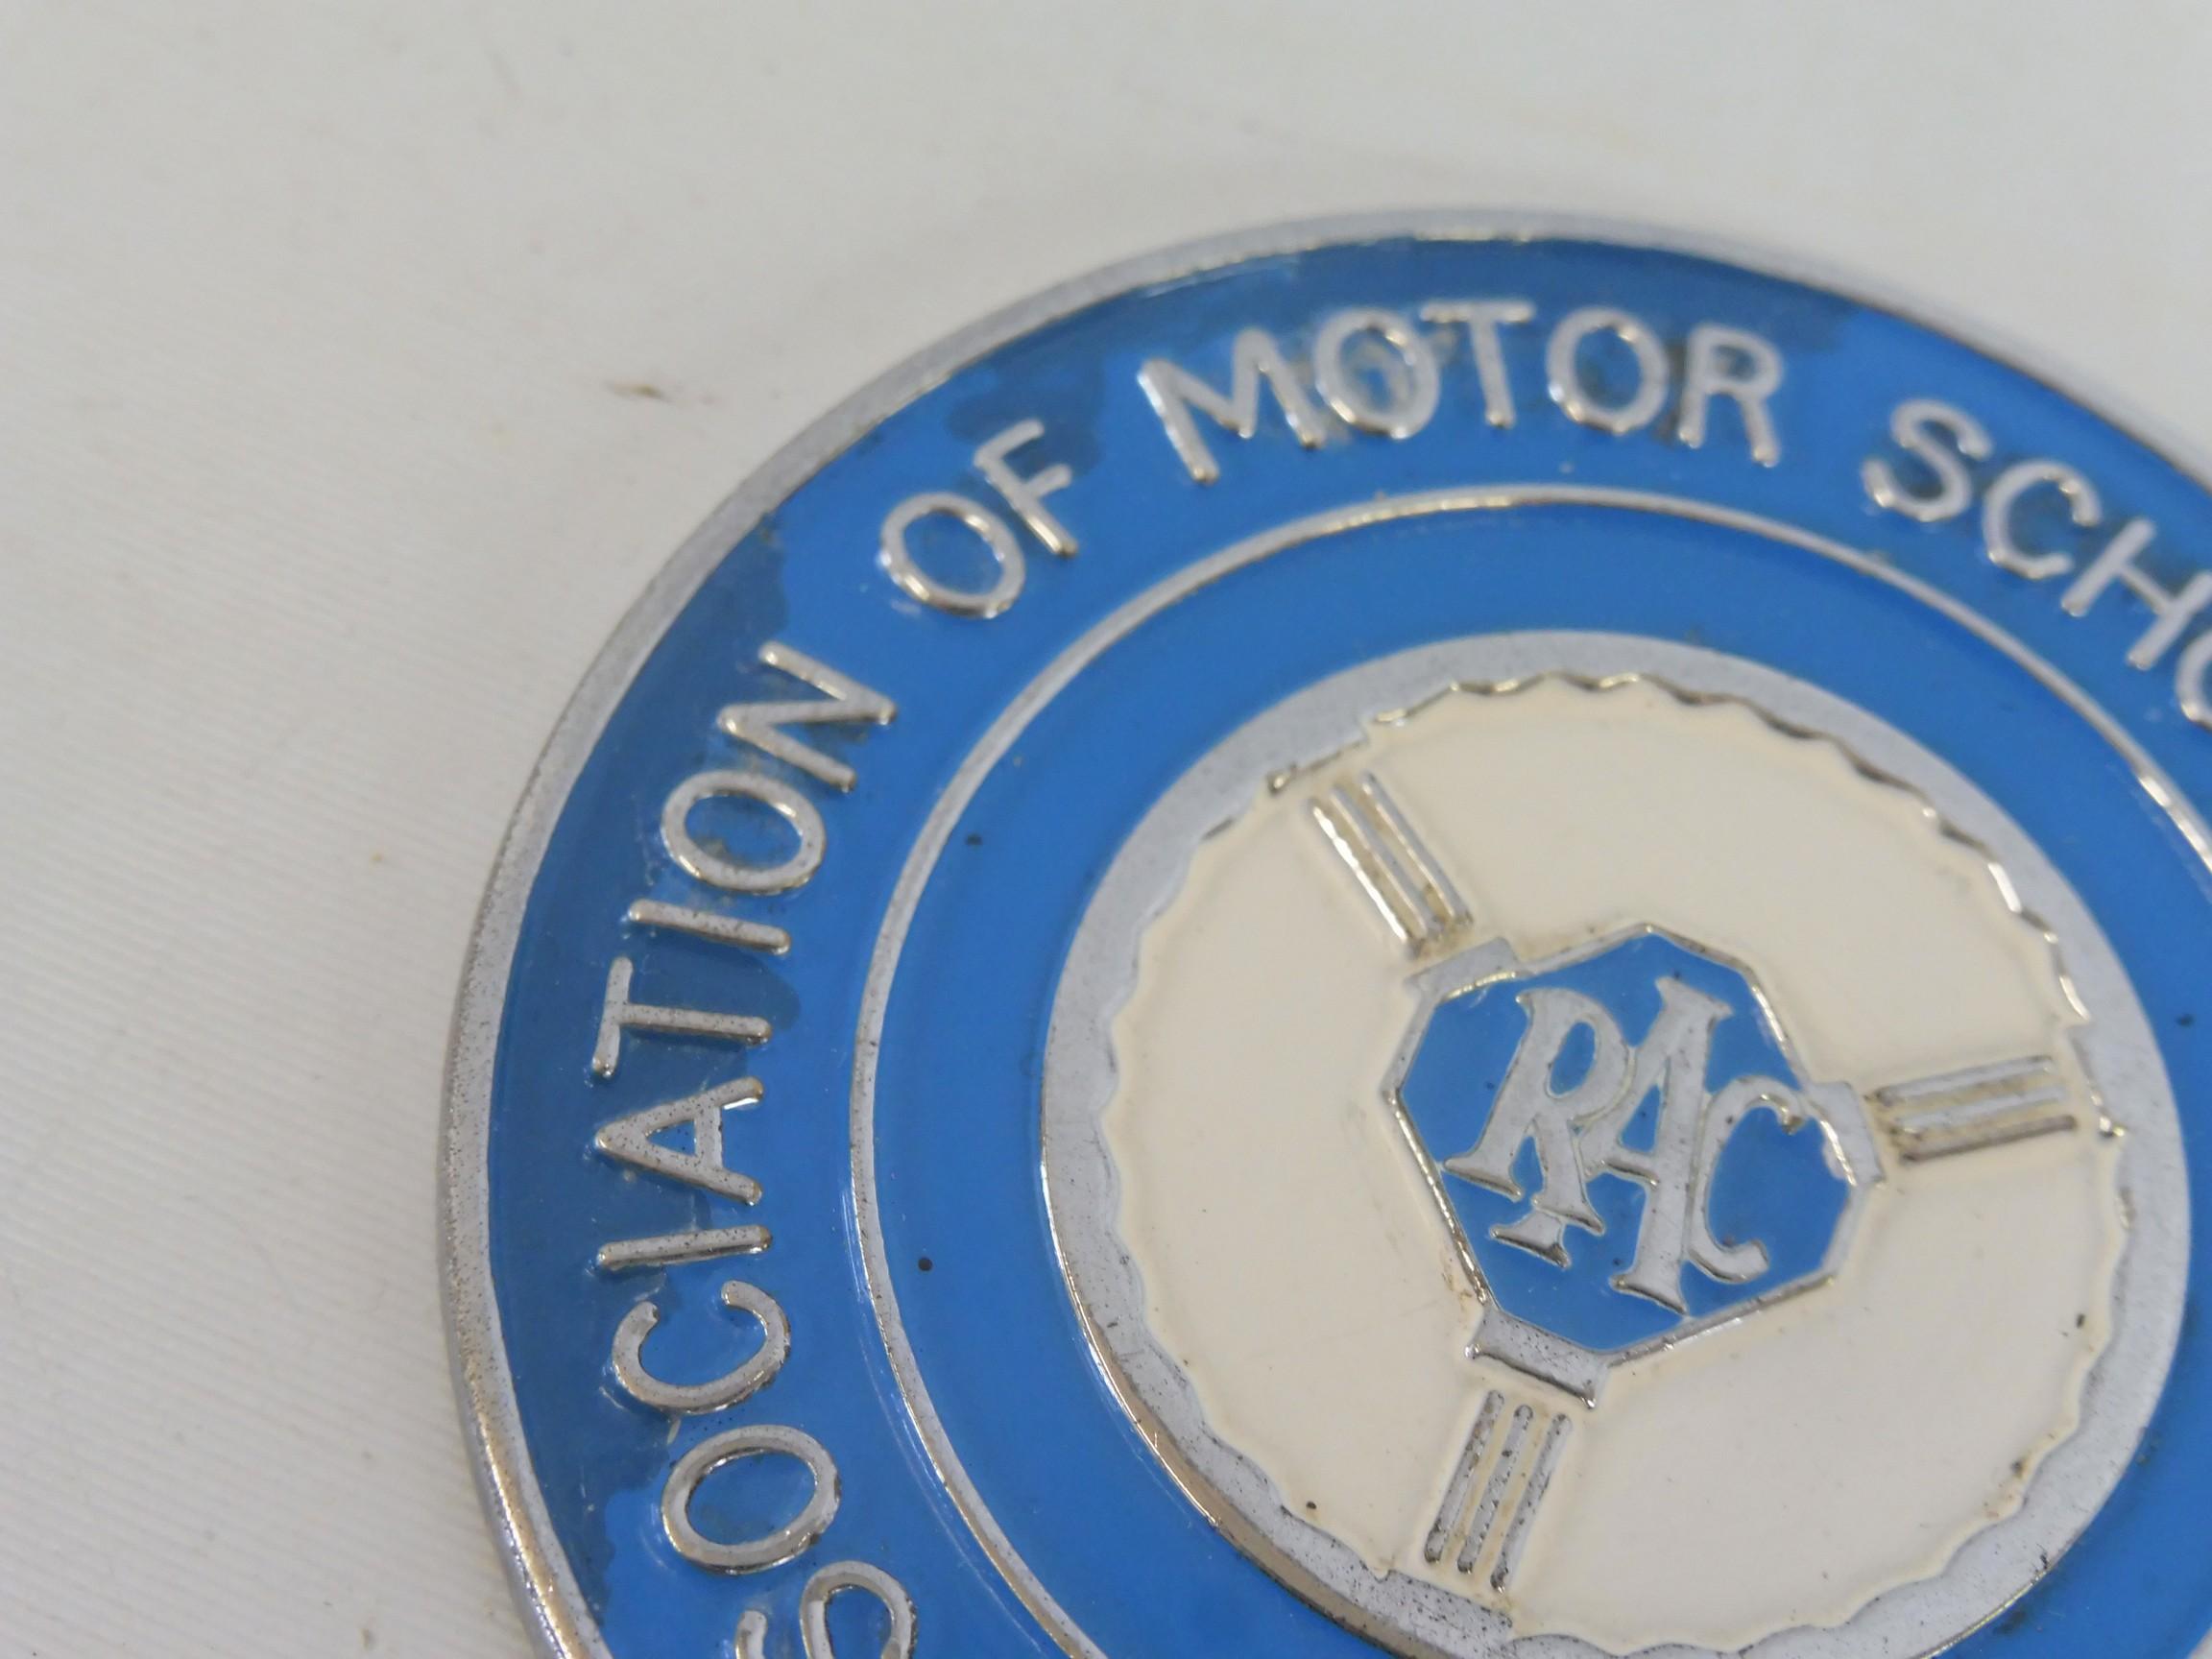 An RAC Association of Motor Schools & Instructors car badge. - Image 2 of 5